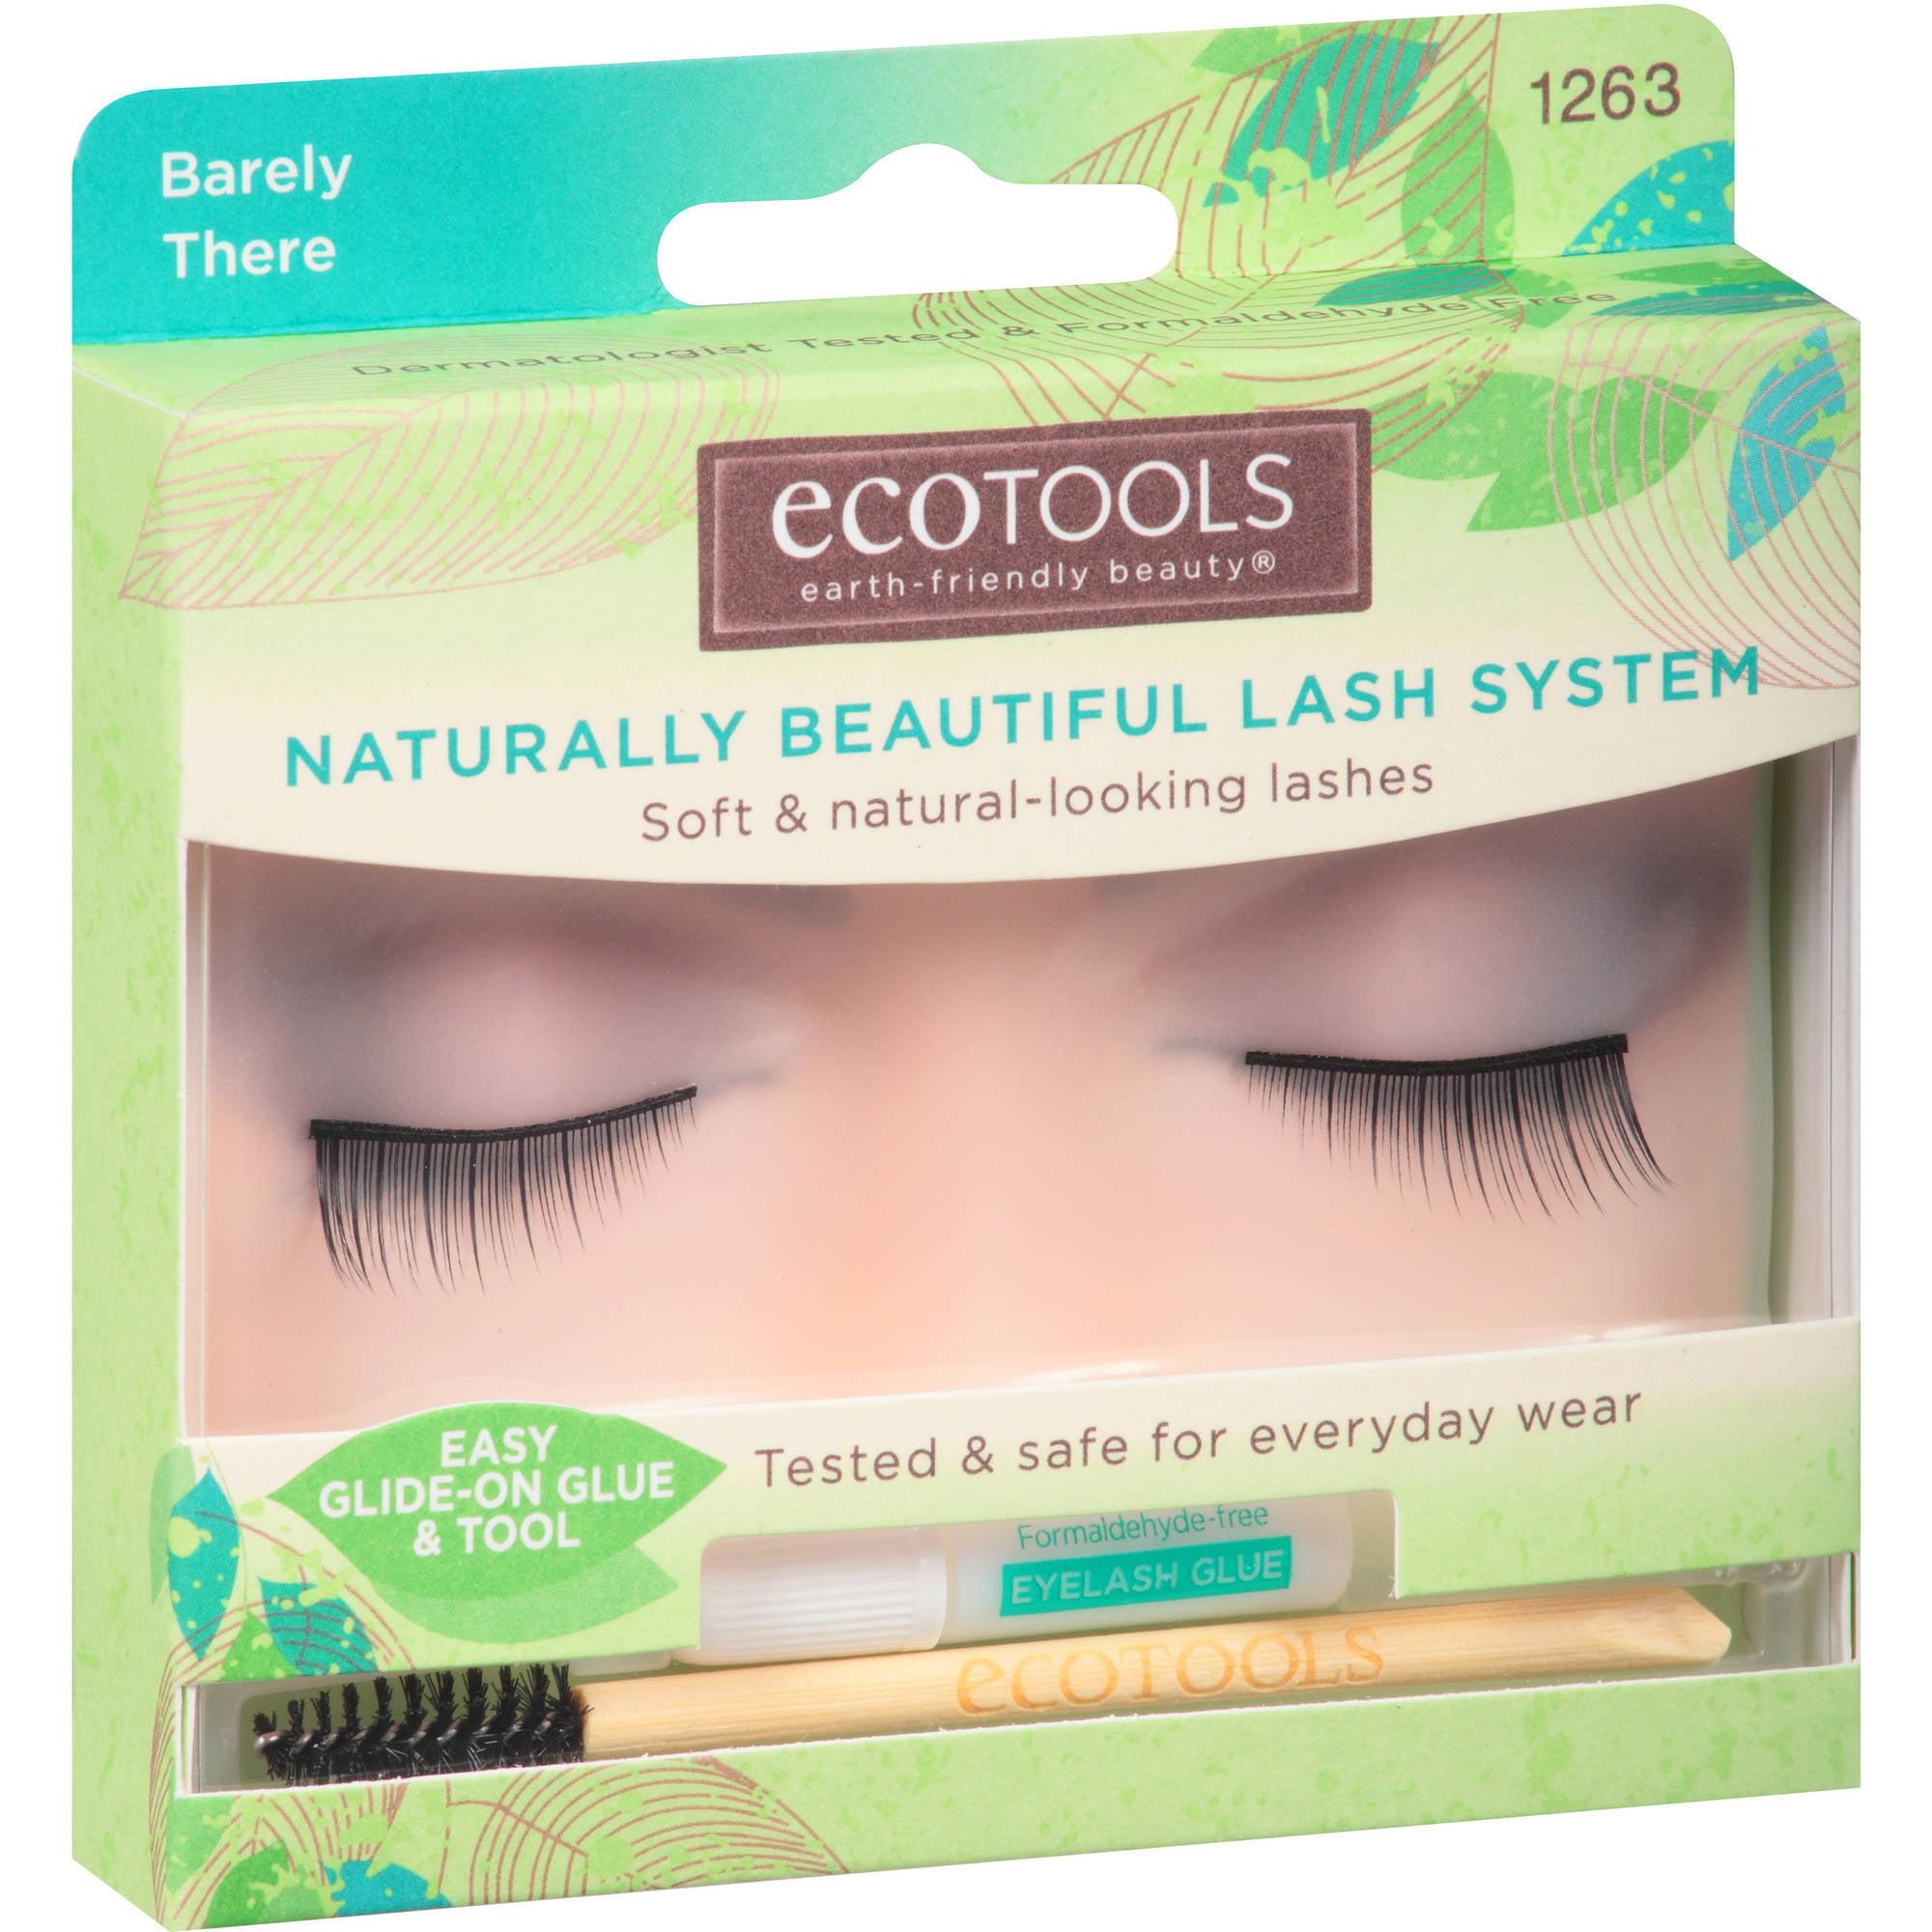 EcoTools Barely There Naturally Beautiful Lash System Eyelashes